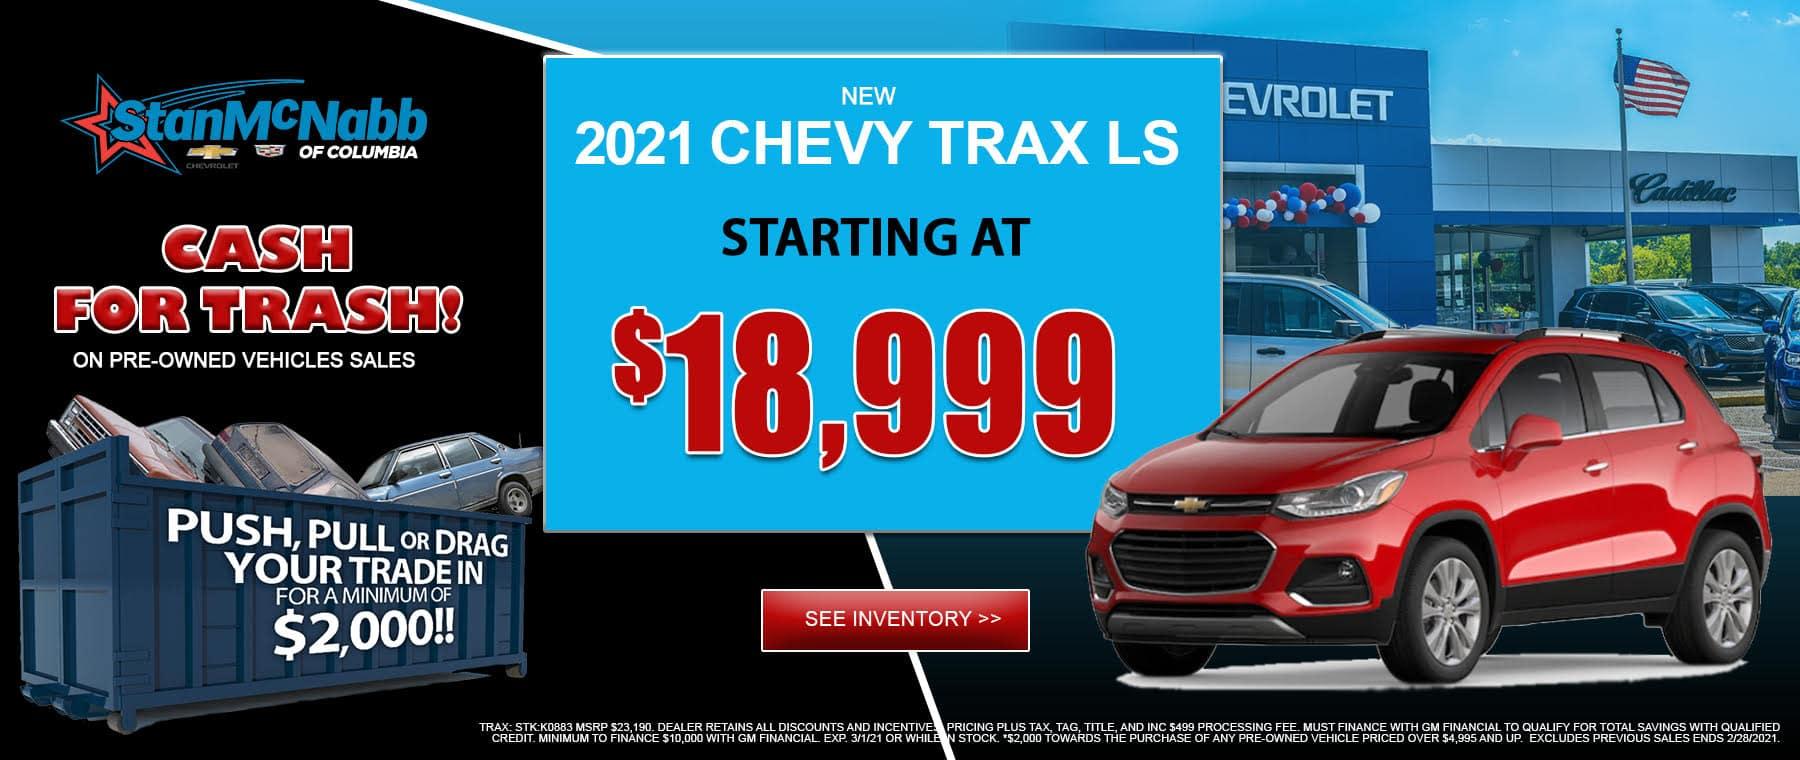 2021 chevy trax ls